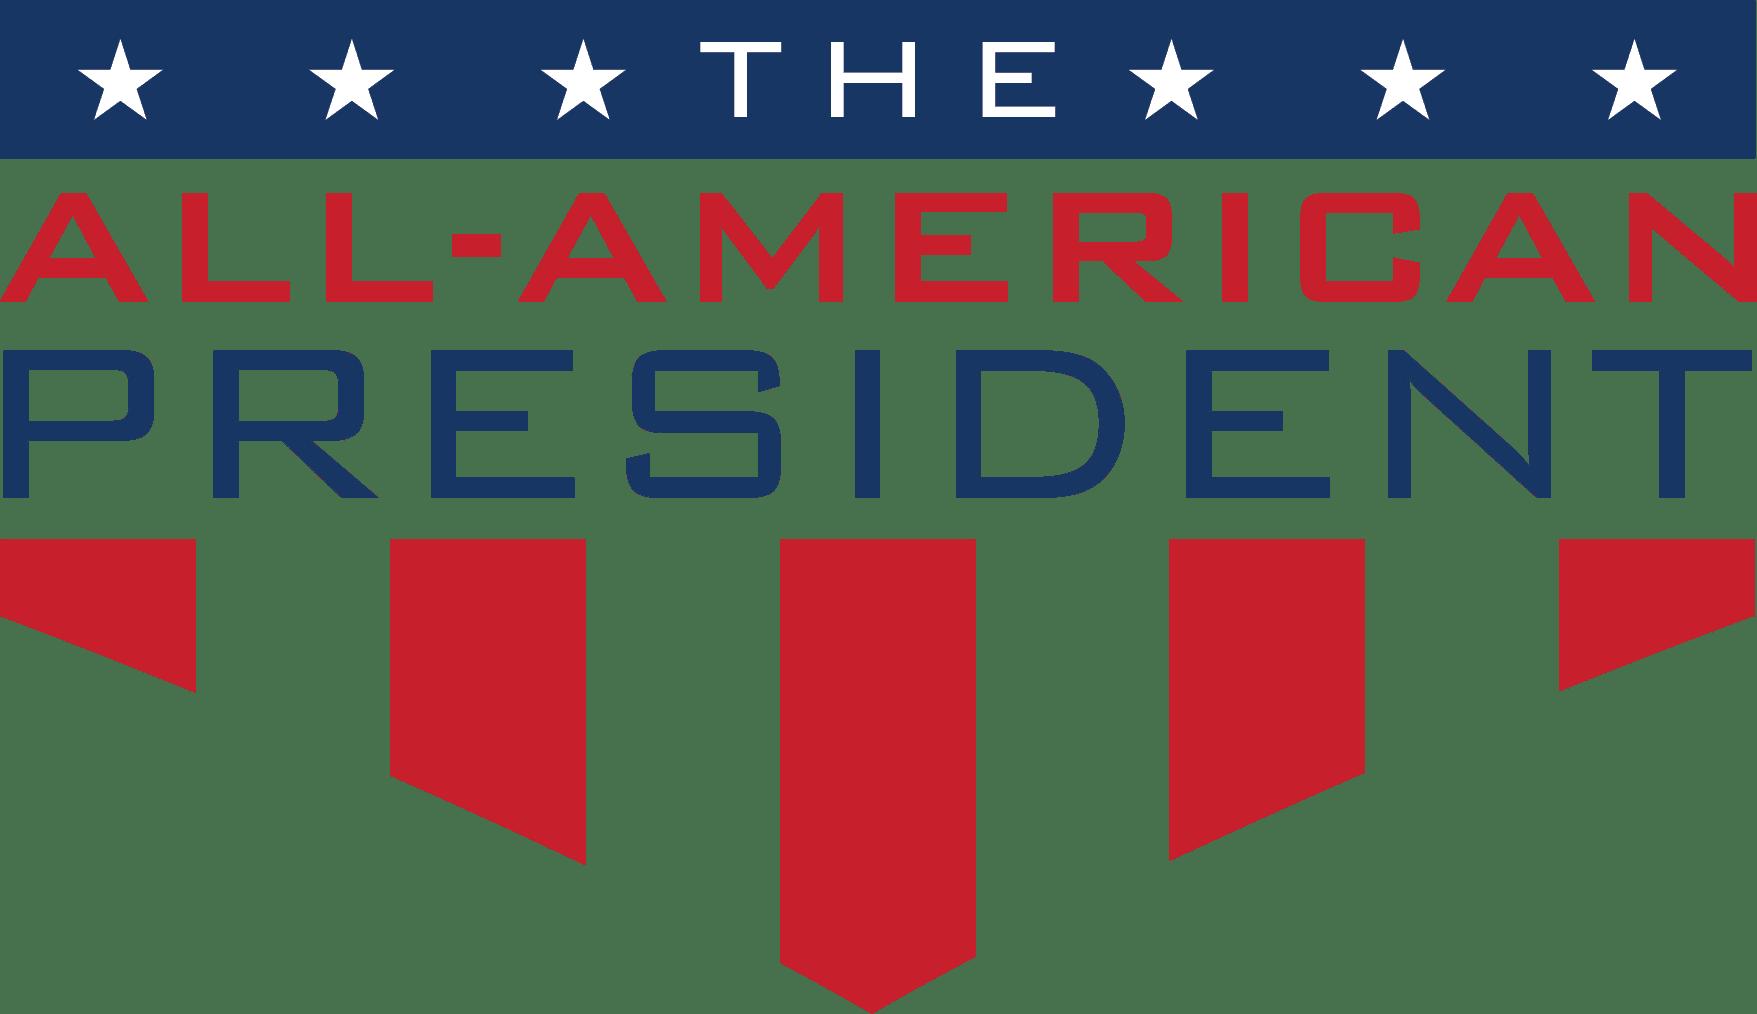 All American President